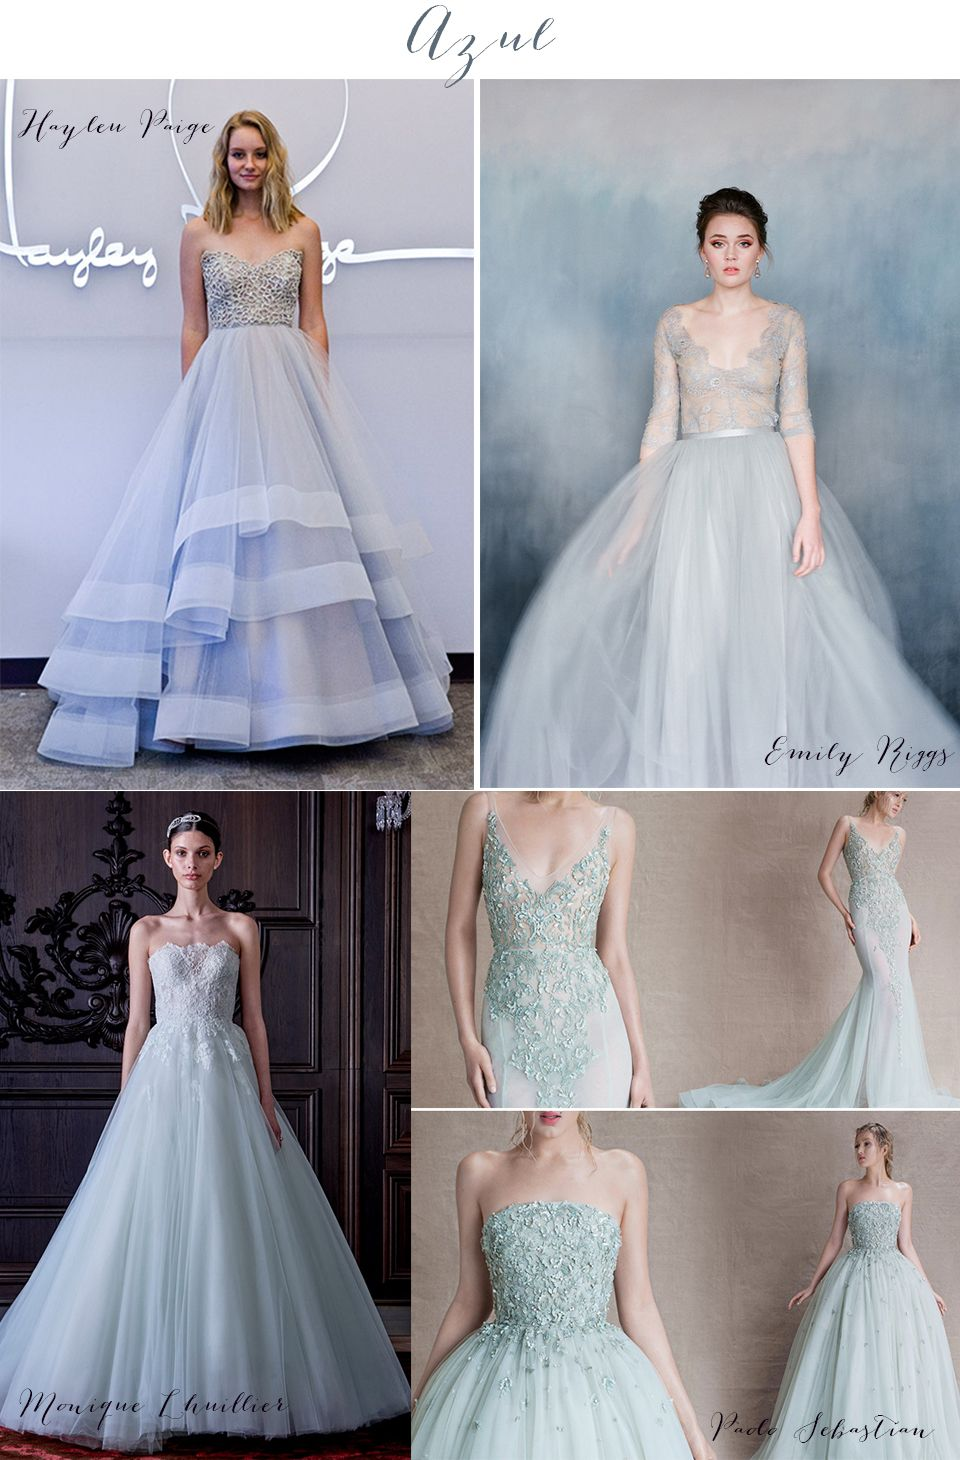 Beautiful Bella From Twilight Wedding Dress Illustration - All ...